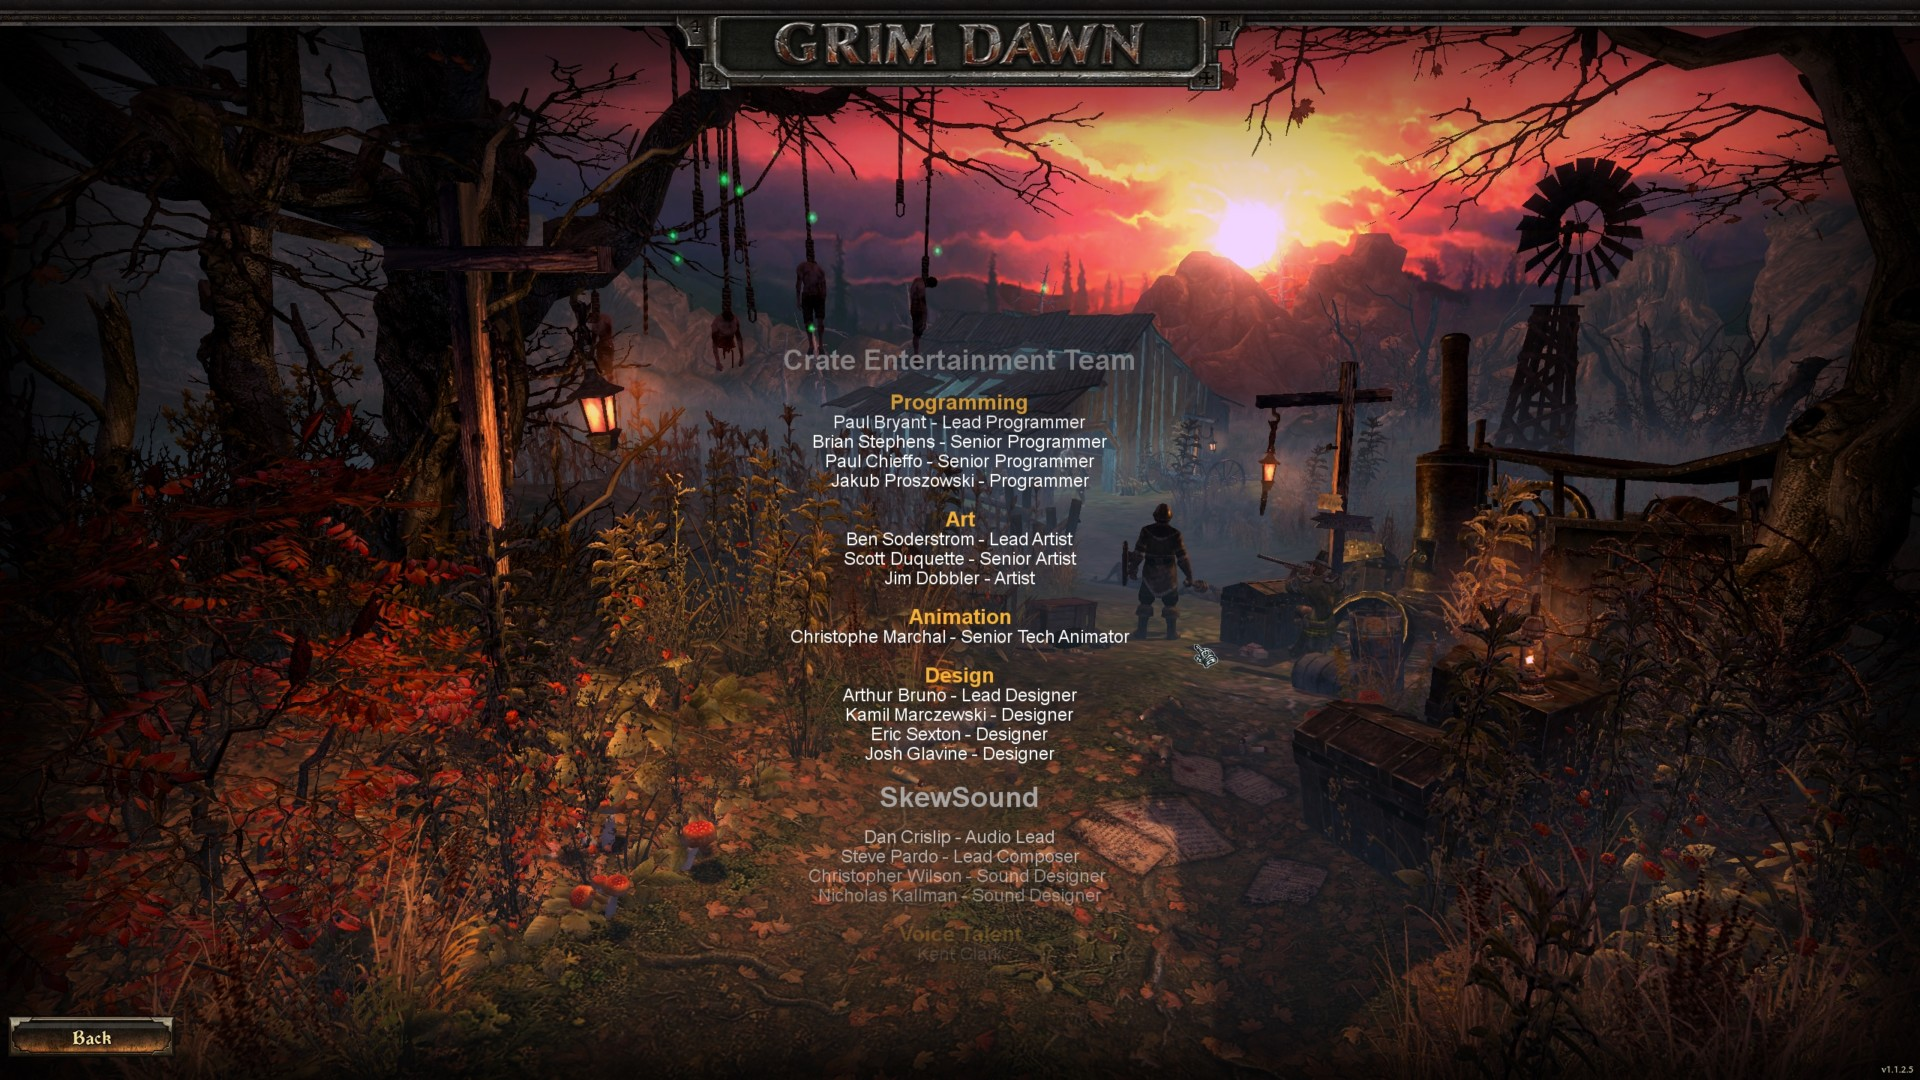 grim-dawn-game-credits